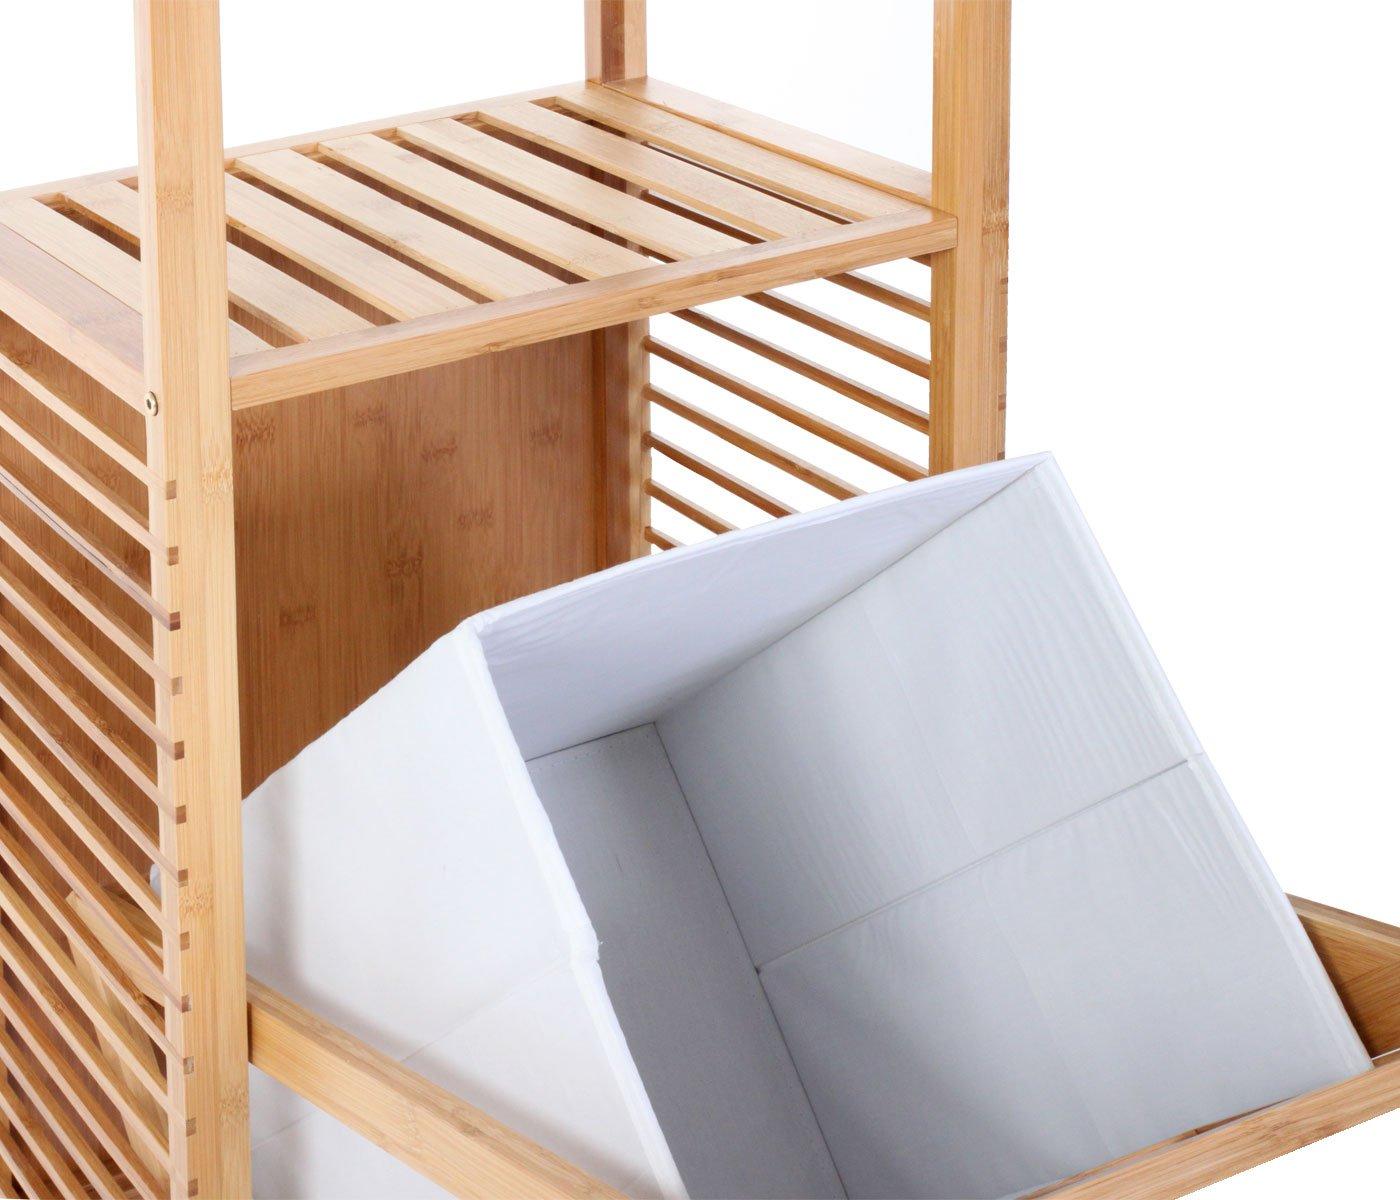 Badezimmer Set Narita, Badschrank Standregal Wäschekorb, Bambus 3 ... | {Badschrank bambus 77}